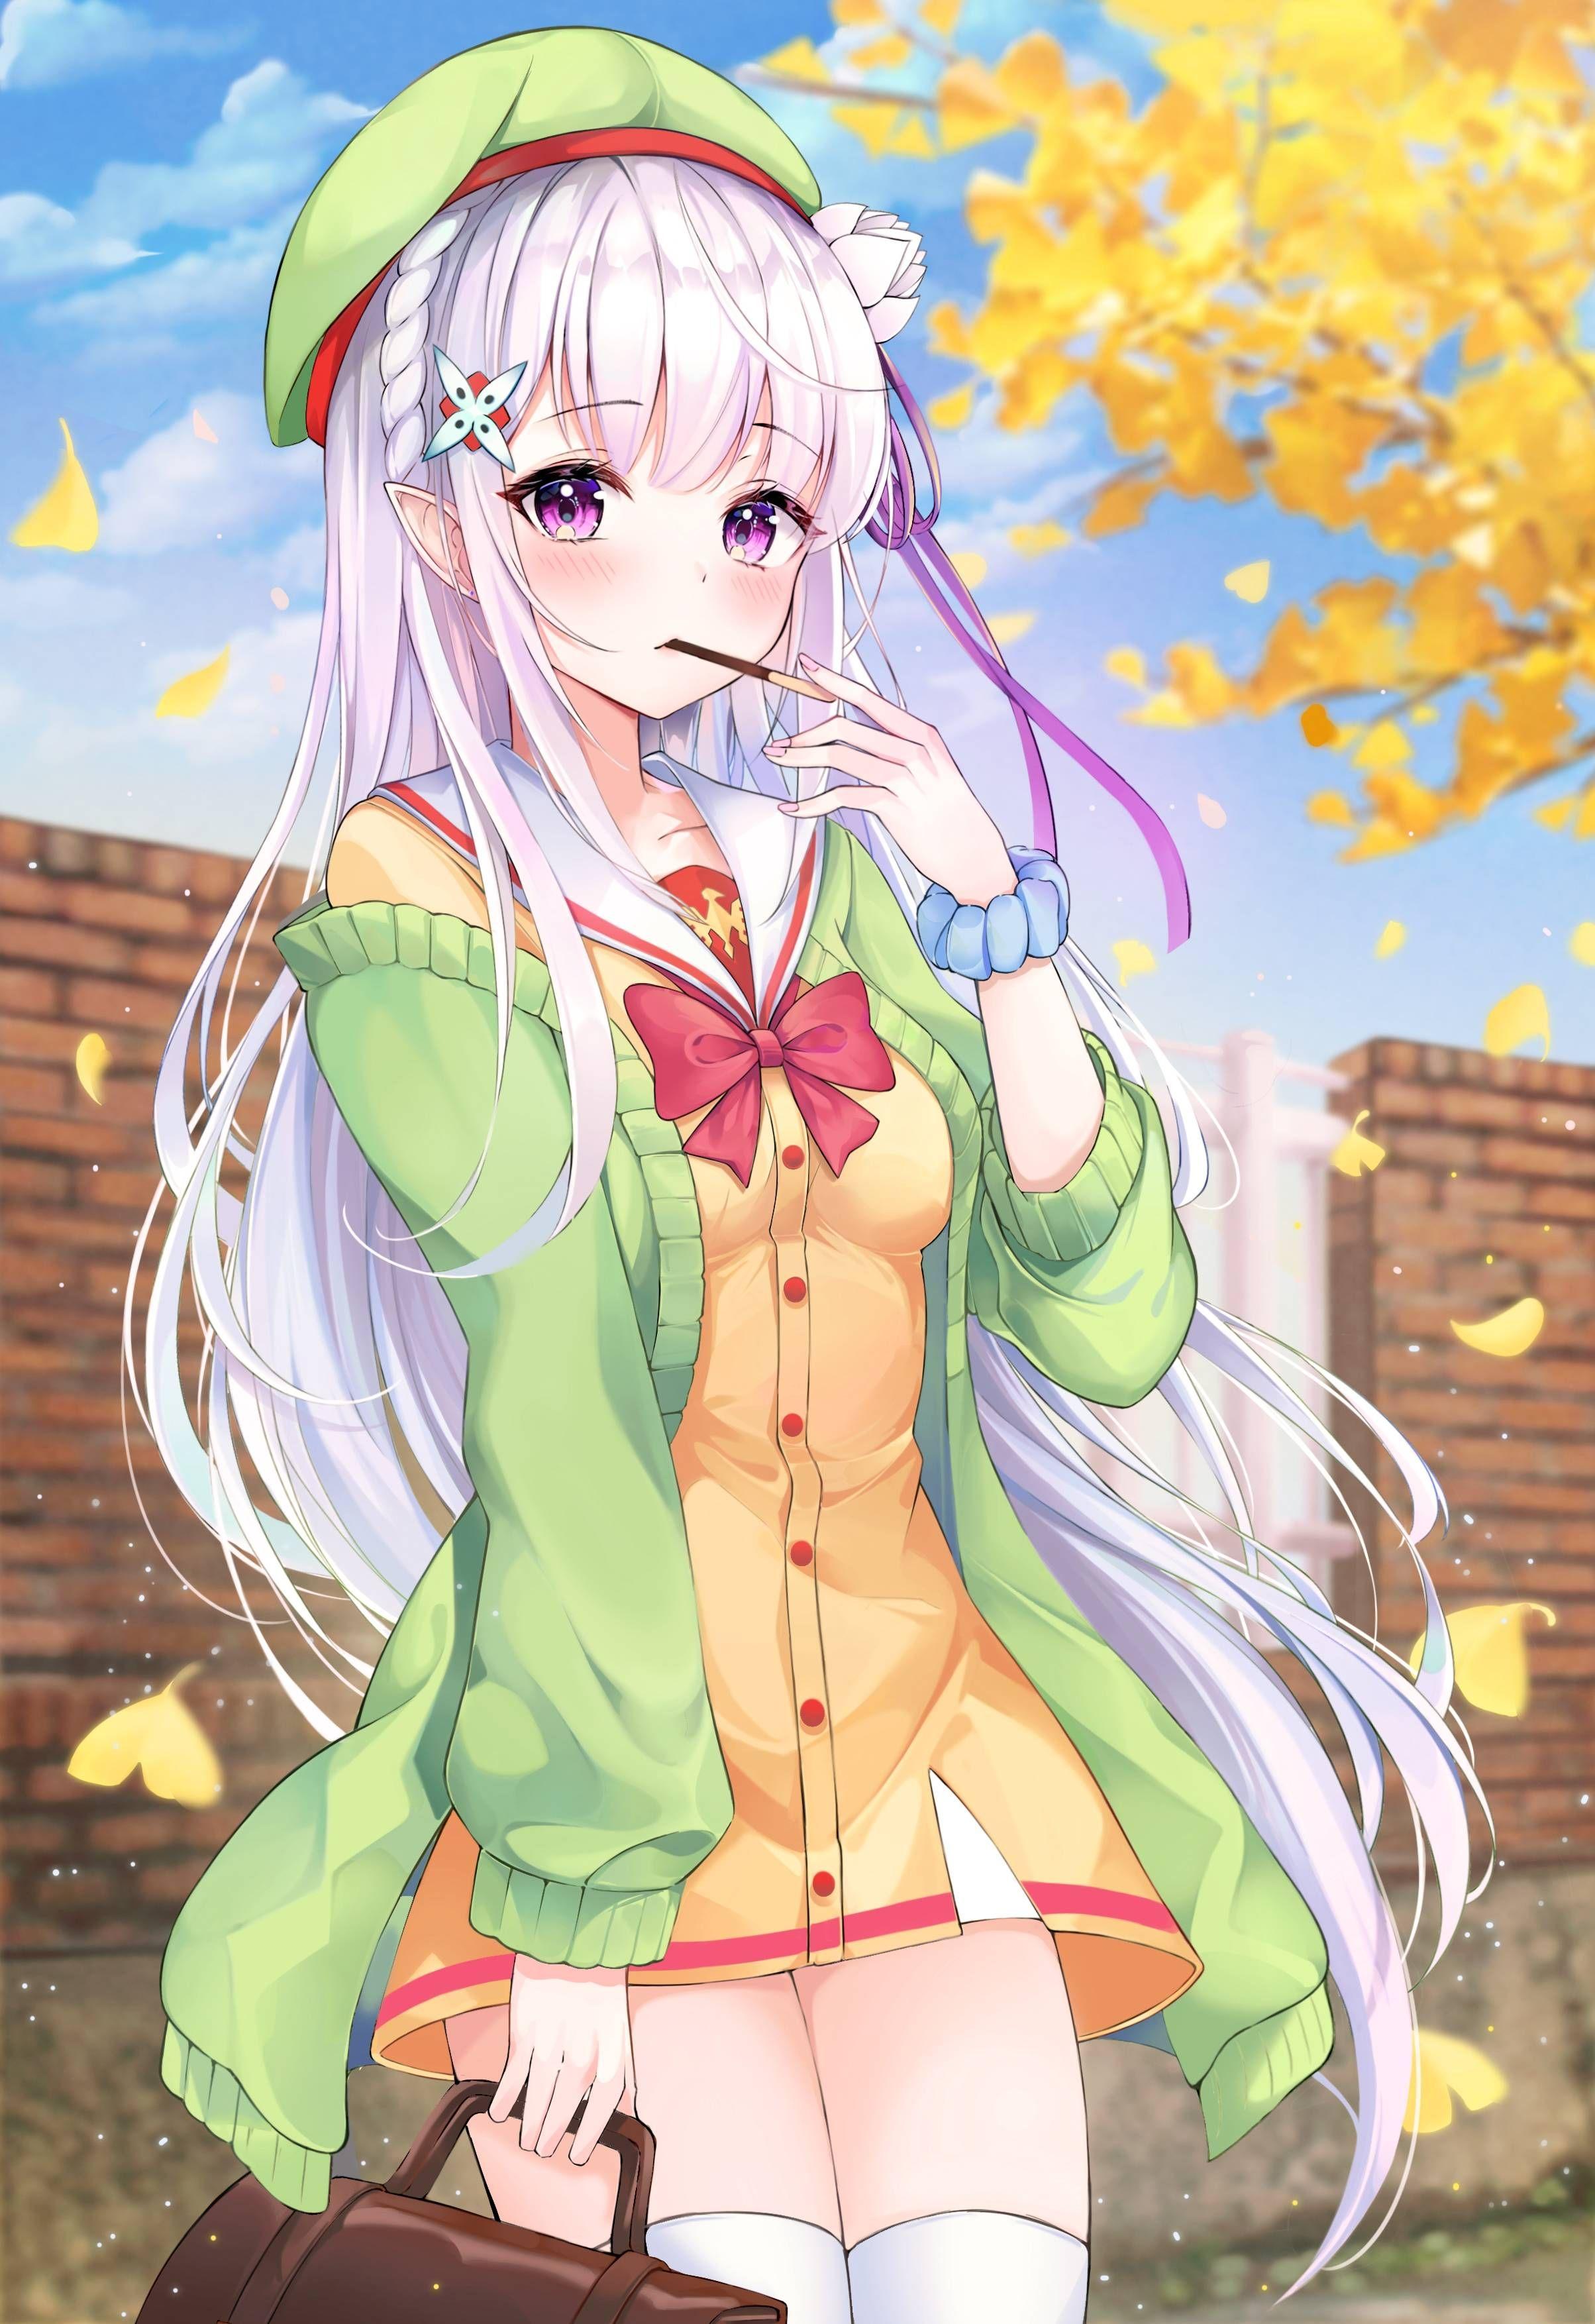 Jk emilia rezero xpost from rjoshi_kosei click on